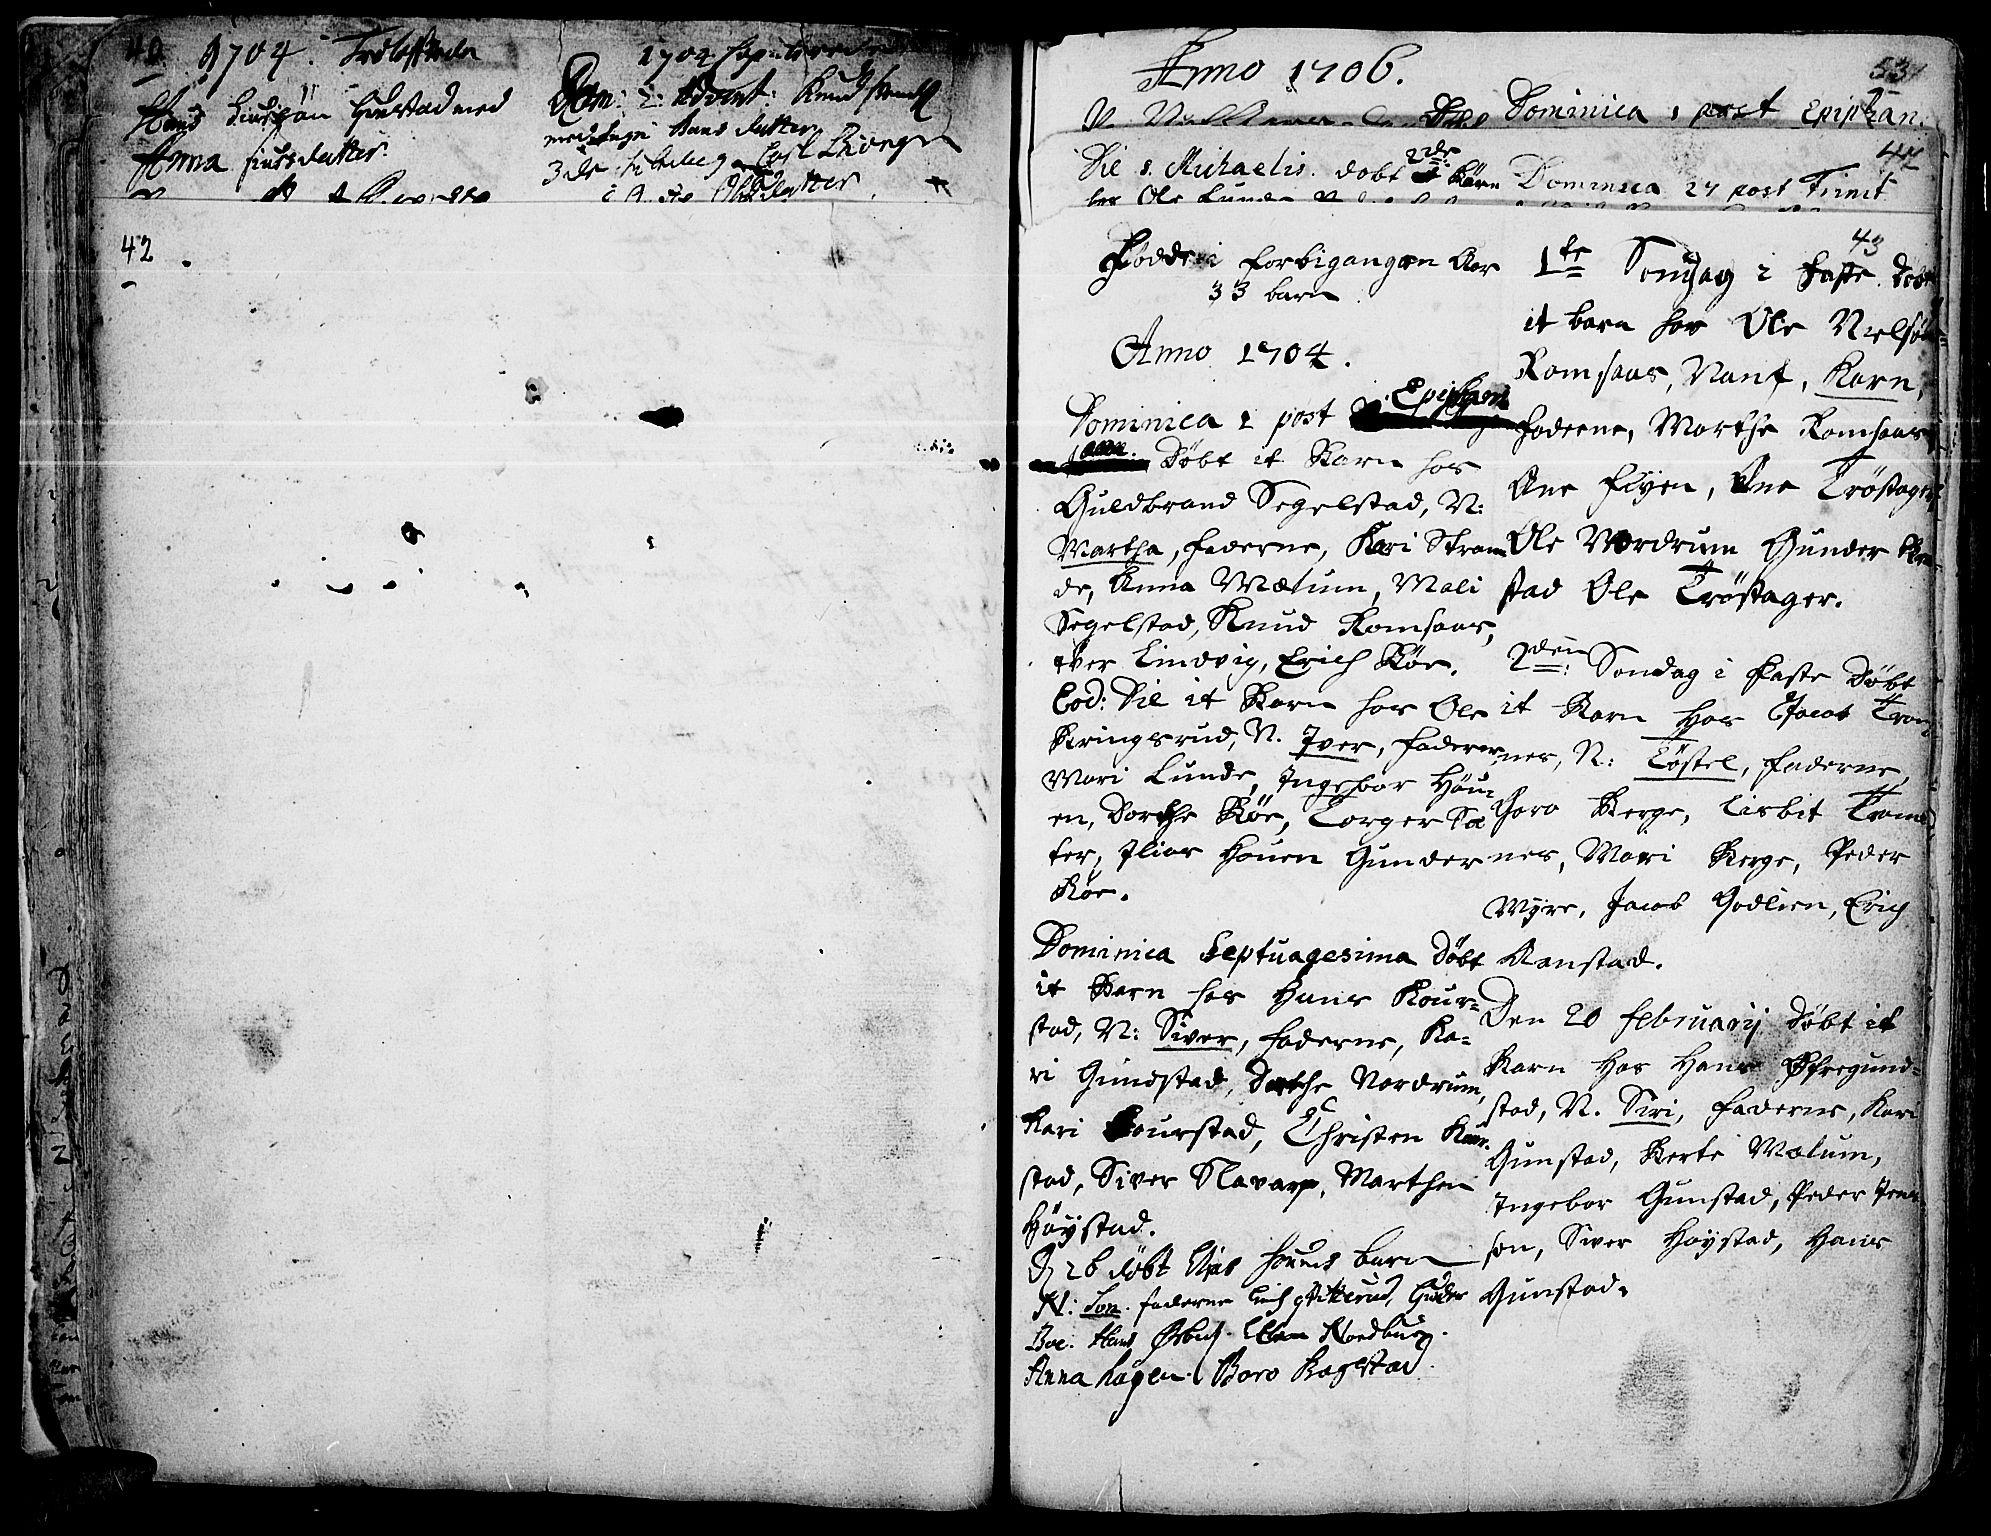 SAH, Ringebu prestekontor, Ministerialbok nr. 1, 1696-1733, s. 42-43